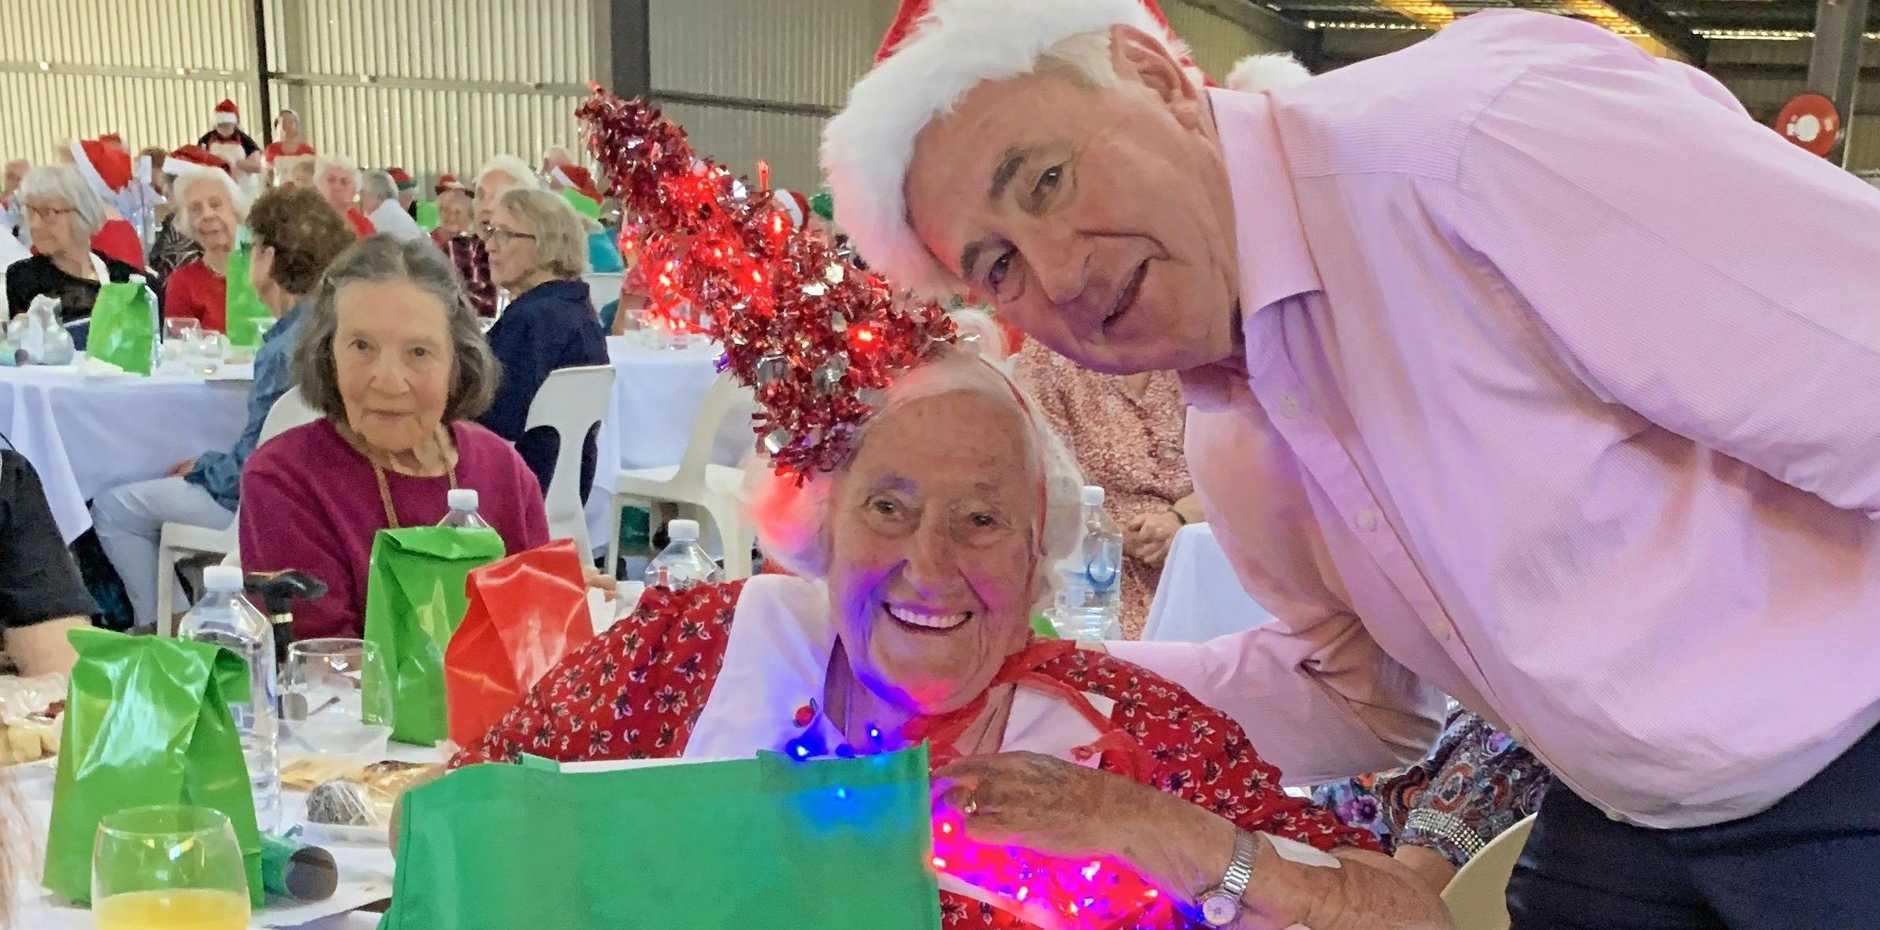 HAPPY DAYS: Mayor Paul Antonio shares a festive moment with resident Kathleen Davey.